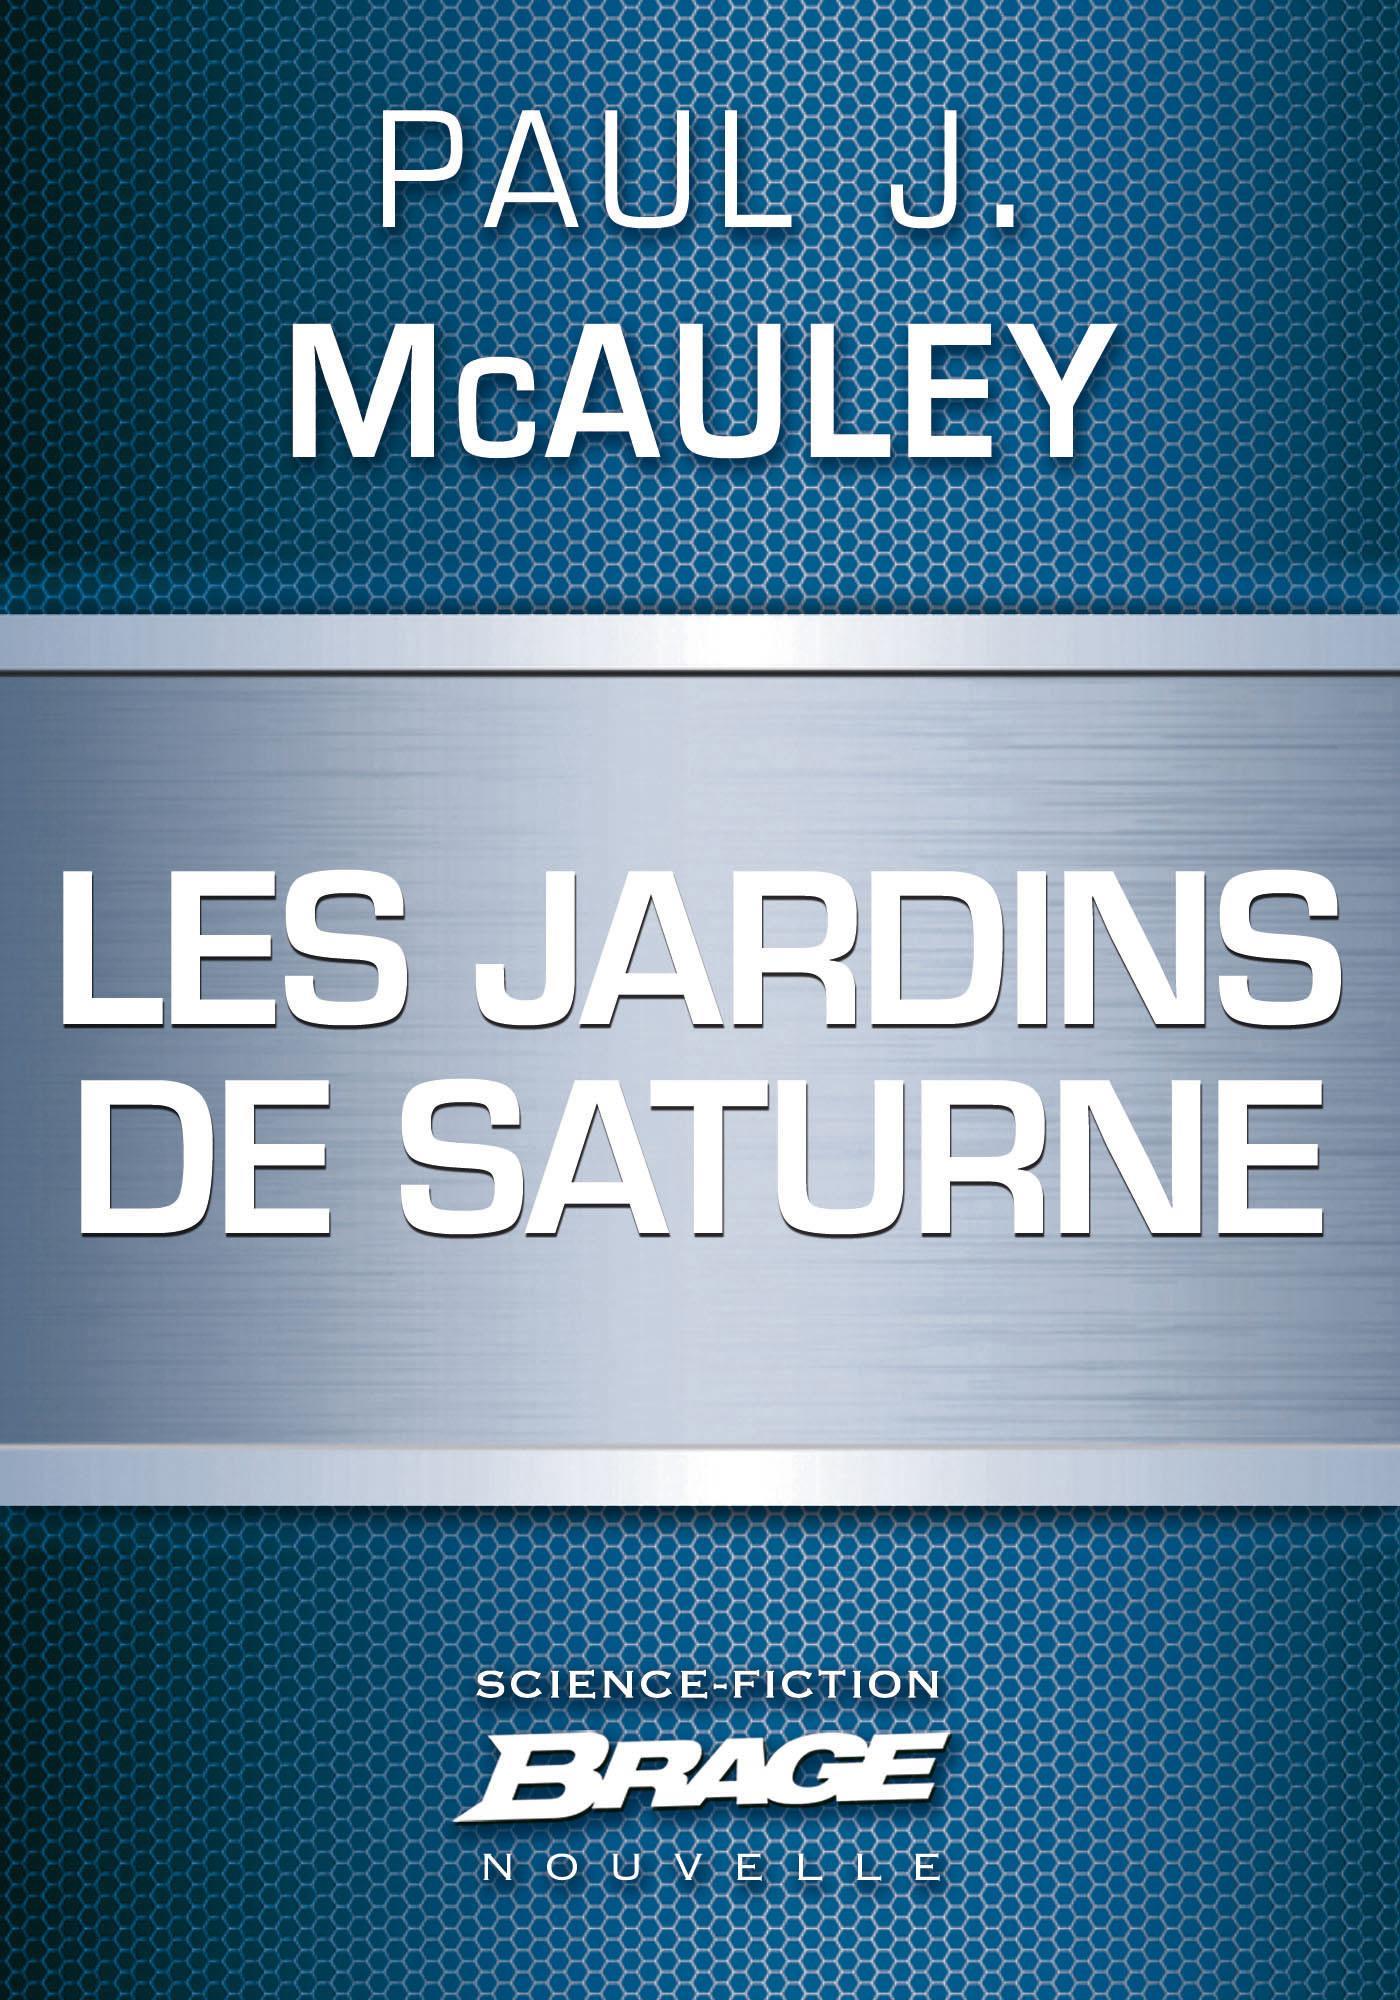 Les Jardins de Saturne